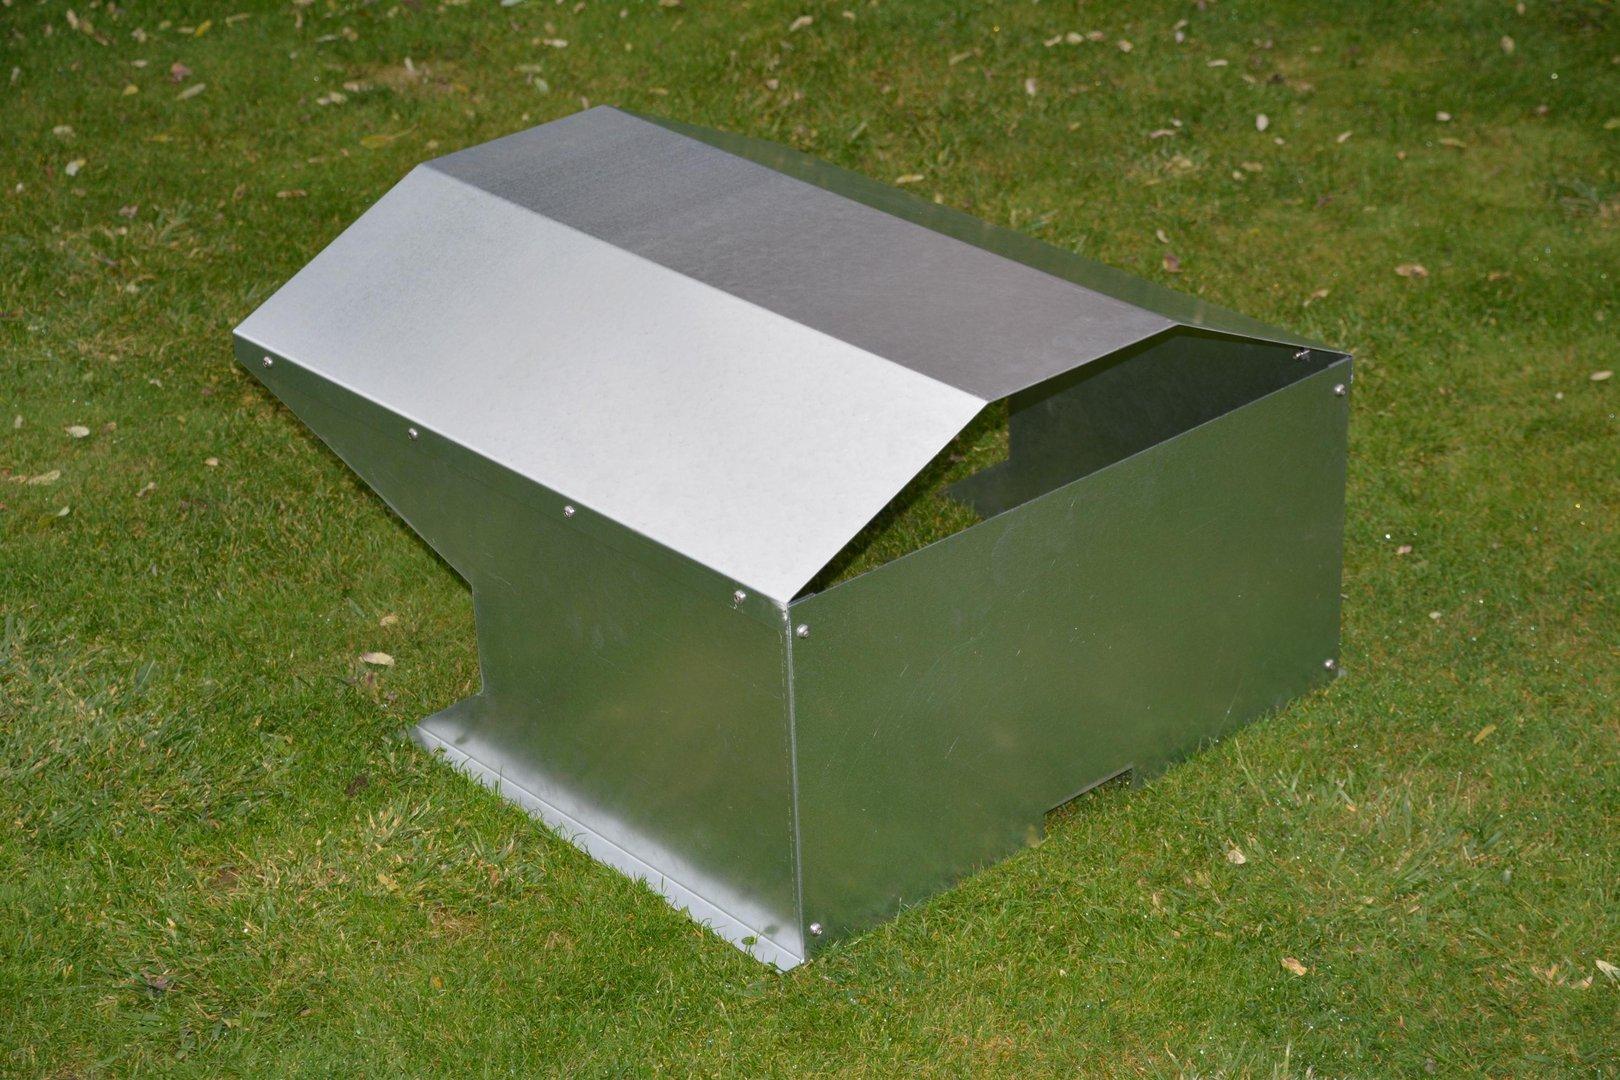 r ckwand f r m hroboter garage verzinkt aus metall. Black Bedroom Furniture Sets. Home Design Ideas